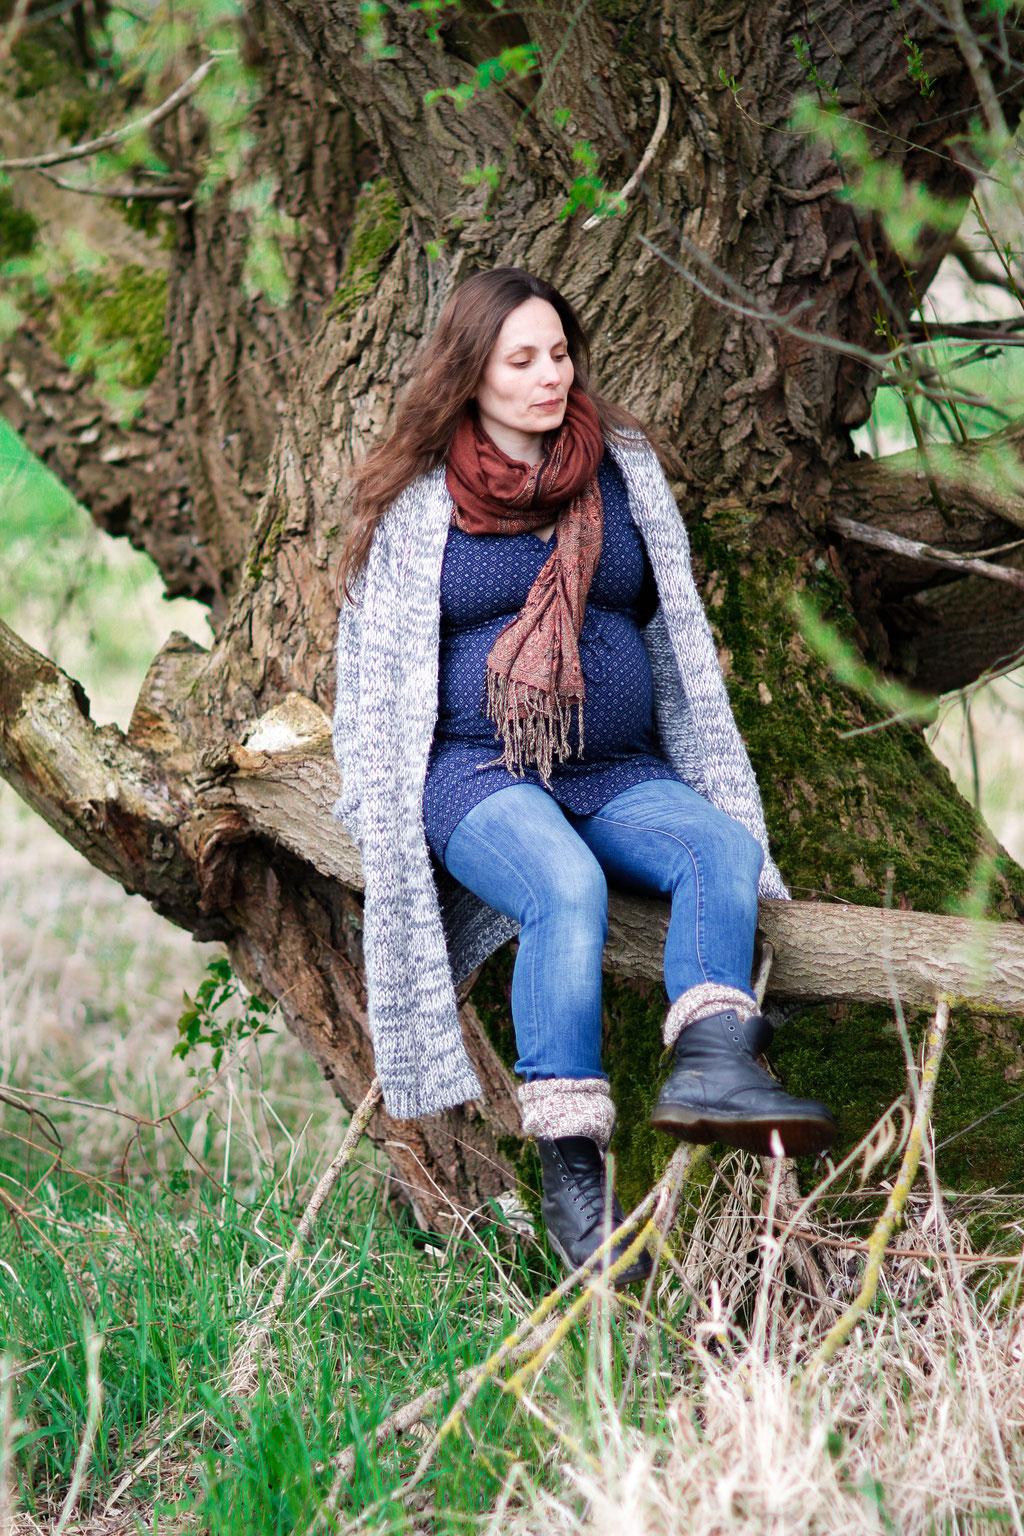 Schwangerschaftsshooting in Neubrandenburg mit Jenny, Christopher & Carl| Wald| Baum| Natur| sitzend| Lächeln| schwanger| Familie| Greifswald| Hendrikje Richert Fotografie